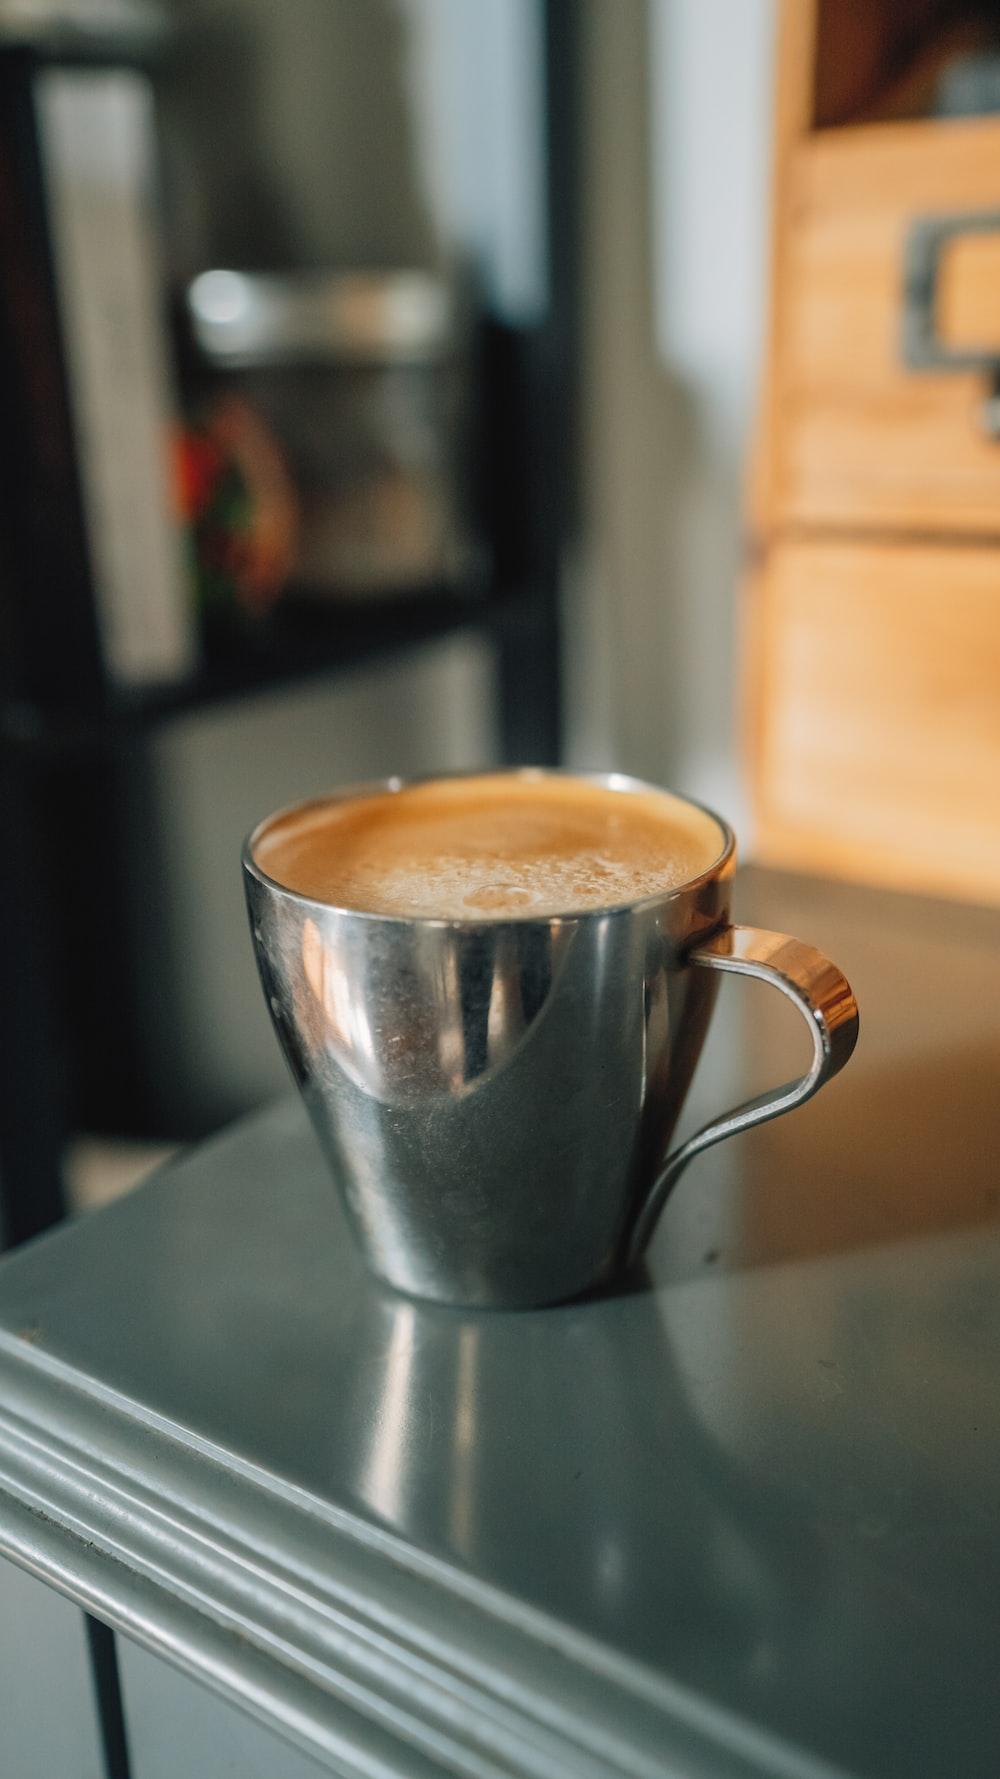 brown liquid in silver and white ceramic mug